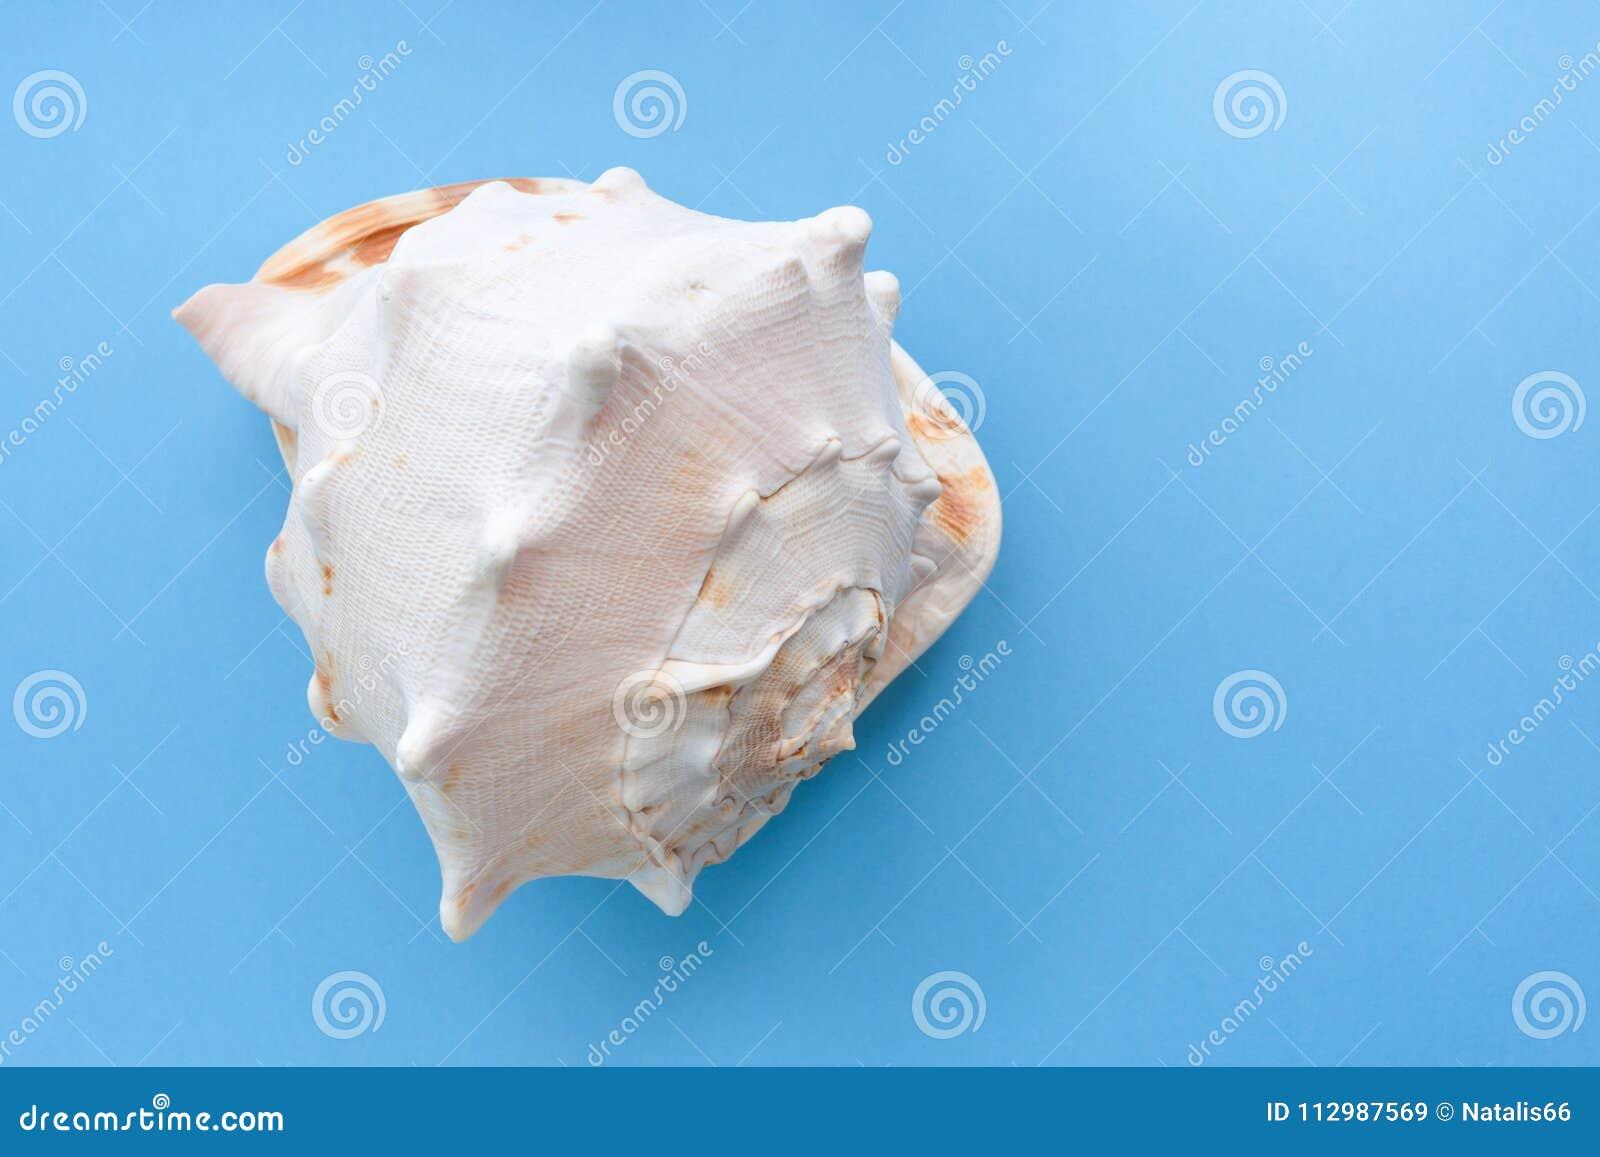 Minimalistic pastel blue background with one big graceful textured seashell.